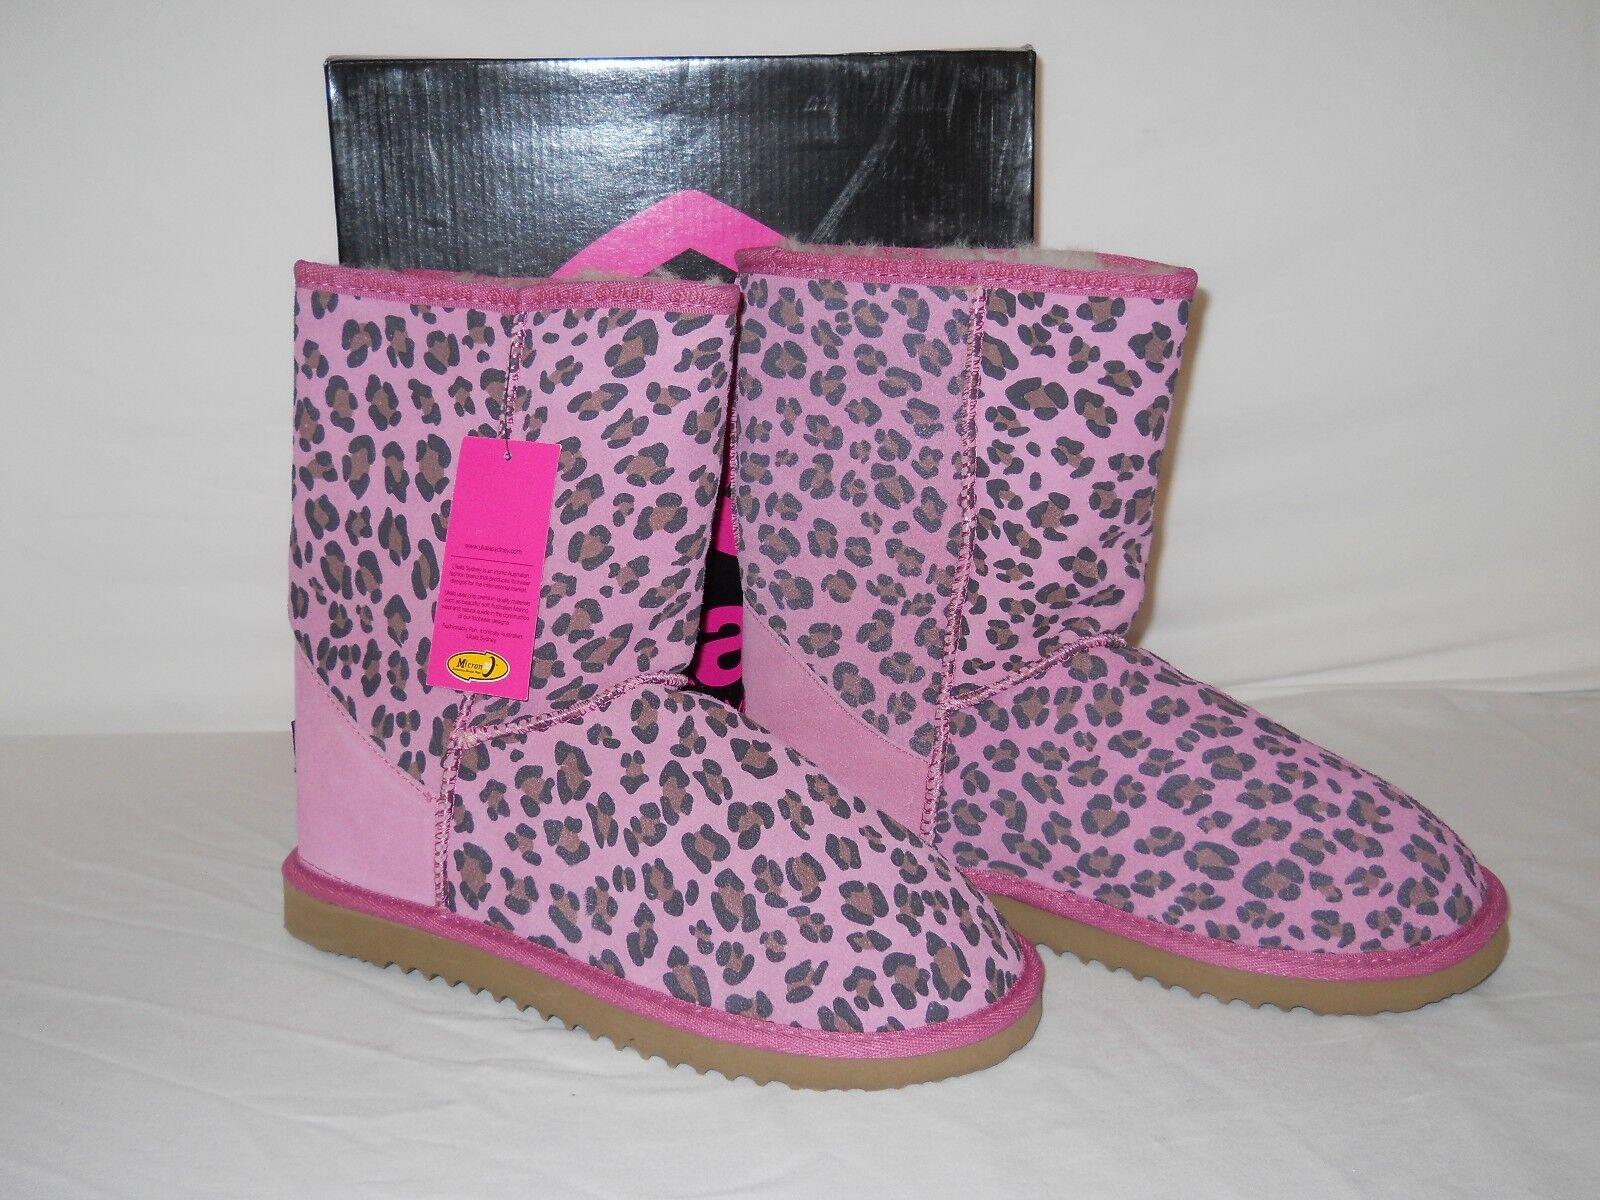 Ukala New Donna Ally Pink Cheetah Wool Stivali 10 M Shoes